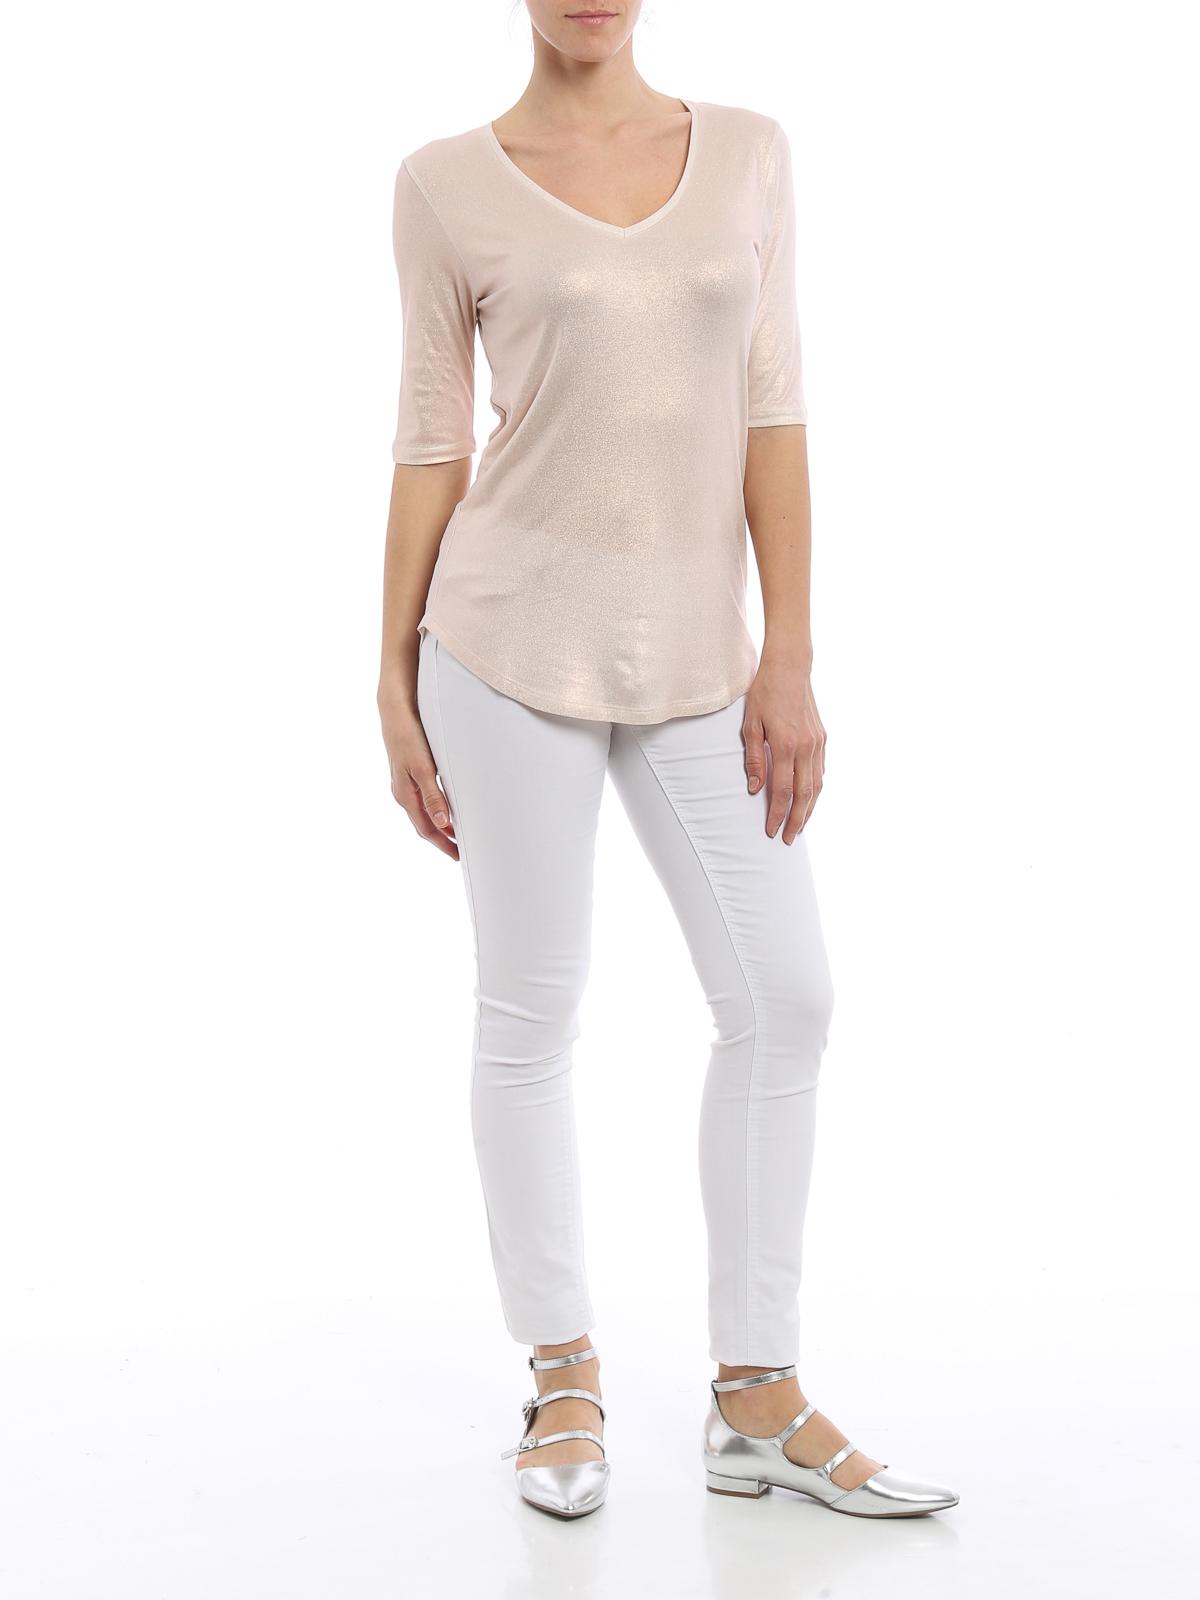 Shiny v neck t shirt by majestic filatures t shirts ikrix for V neck t shirt online shopping